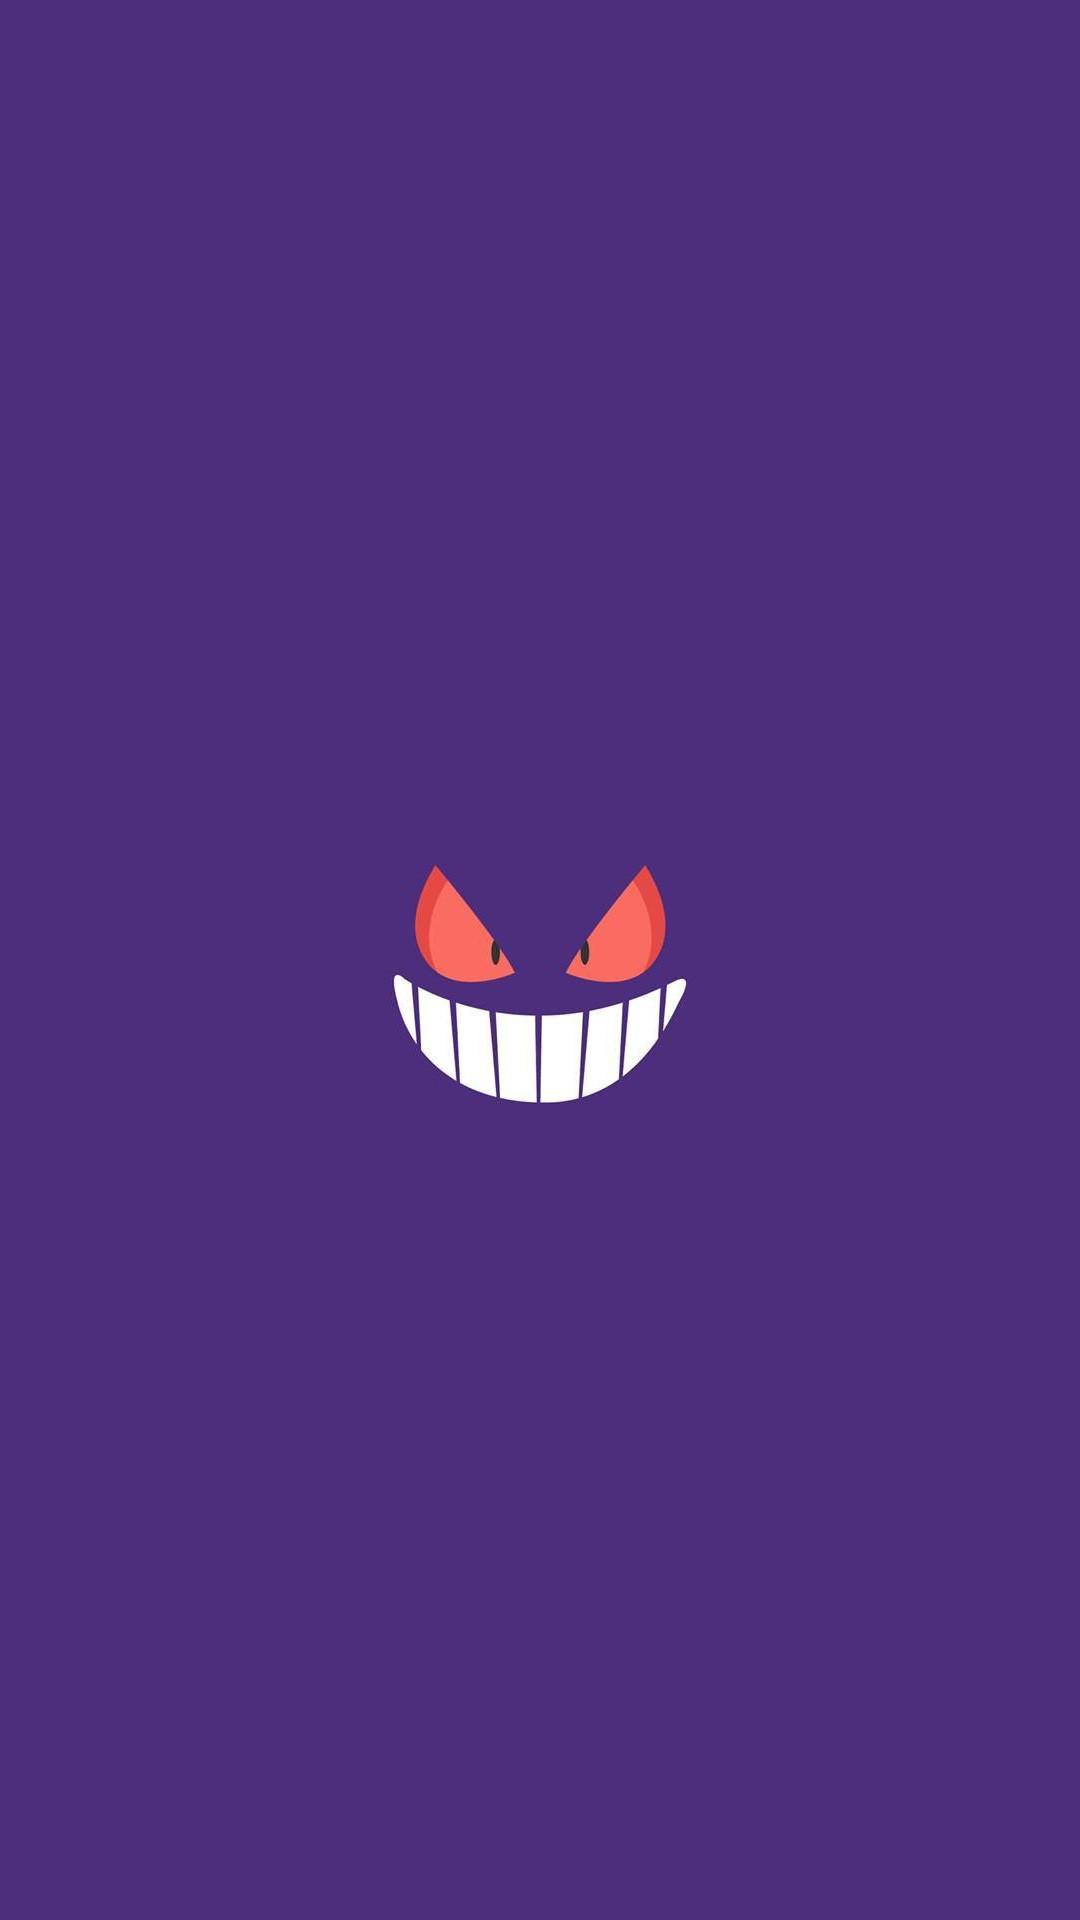 1080x1920 Gengar Pokemon Character IPhone 6 HD Wallpaper